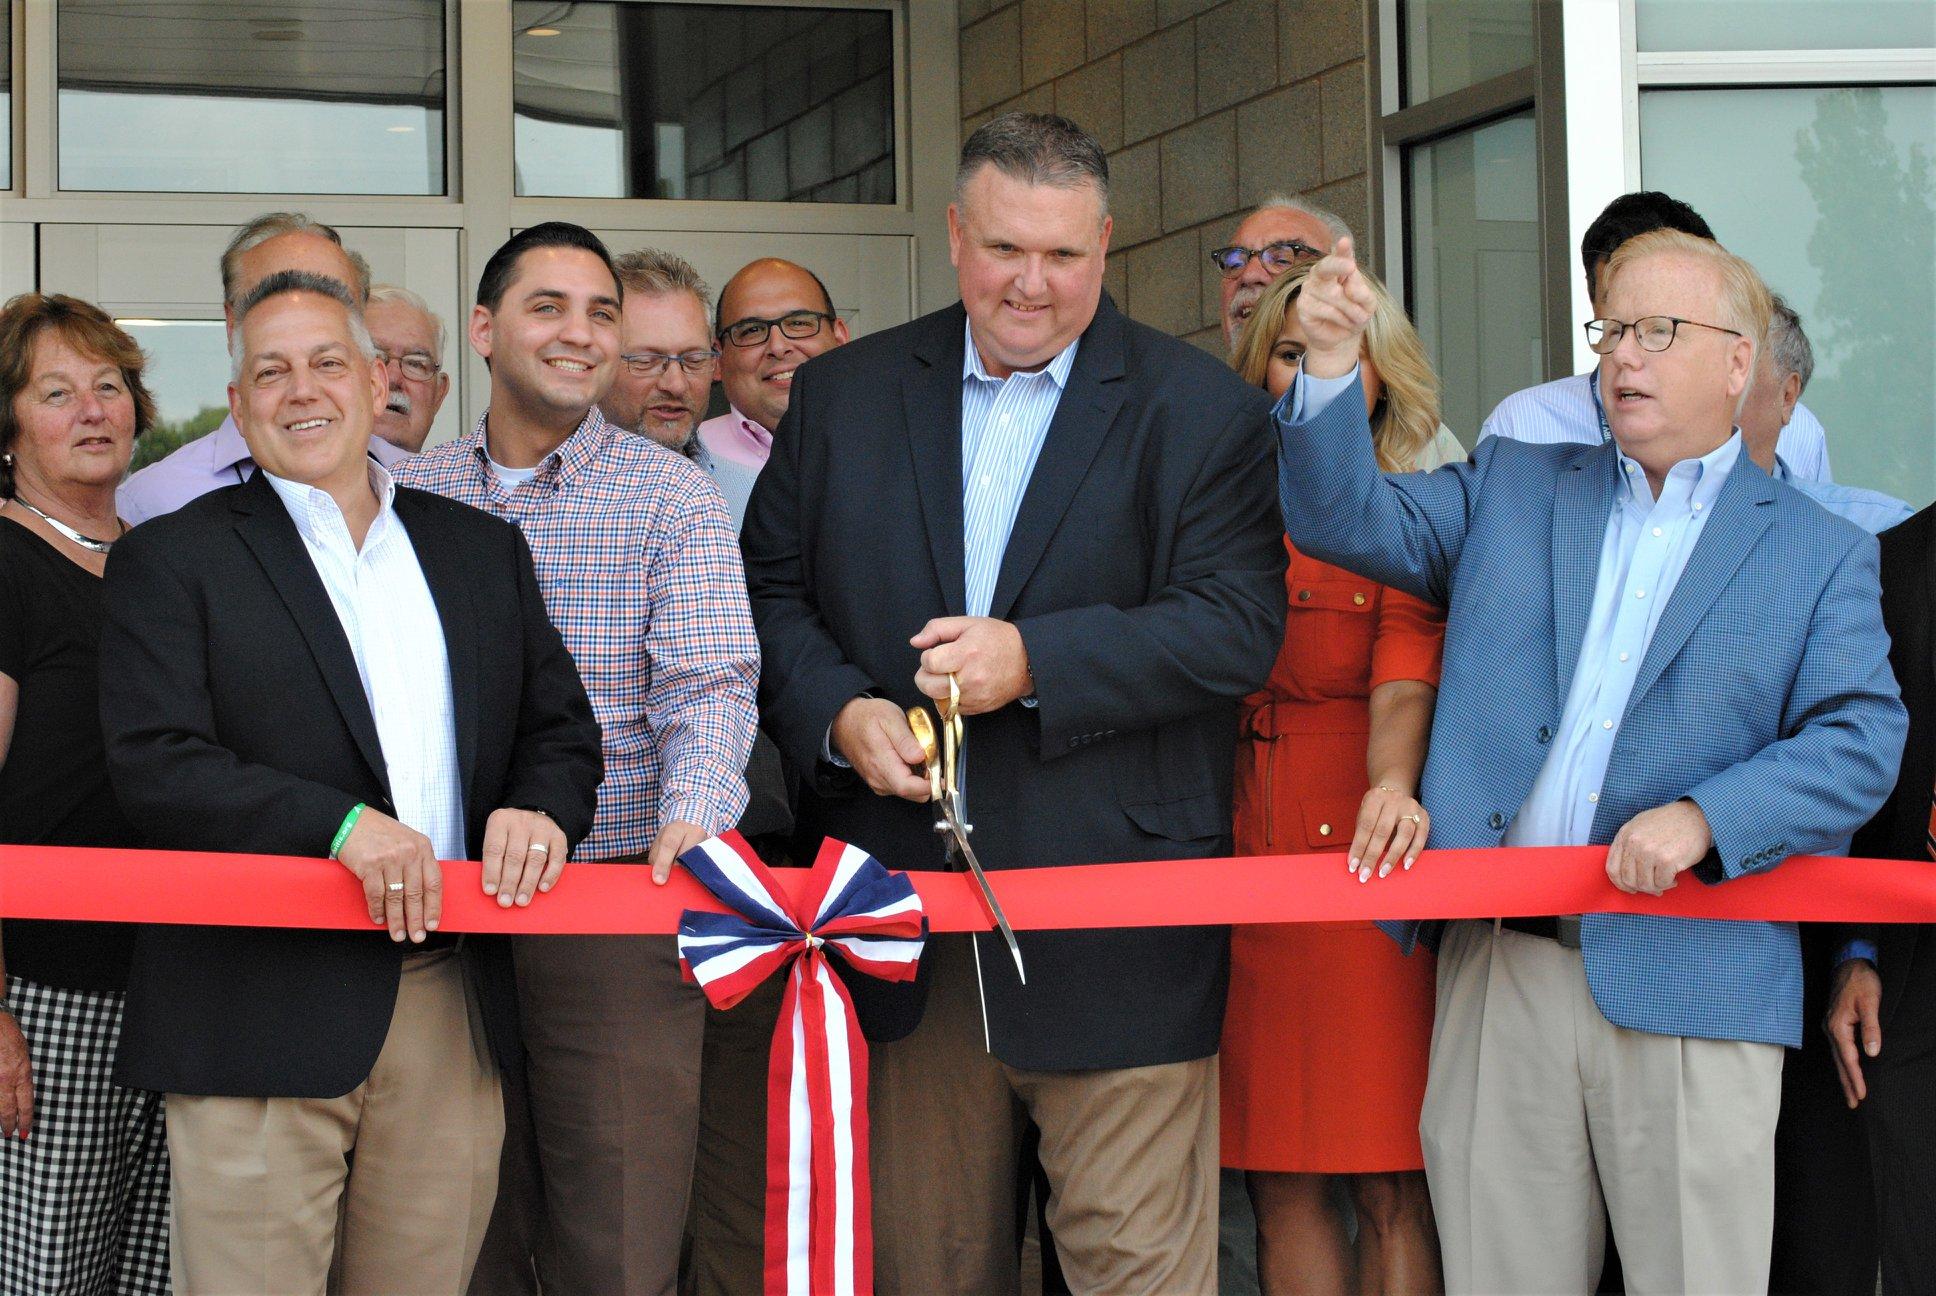 Ribbon cut at renovated, expanded Danbury High School